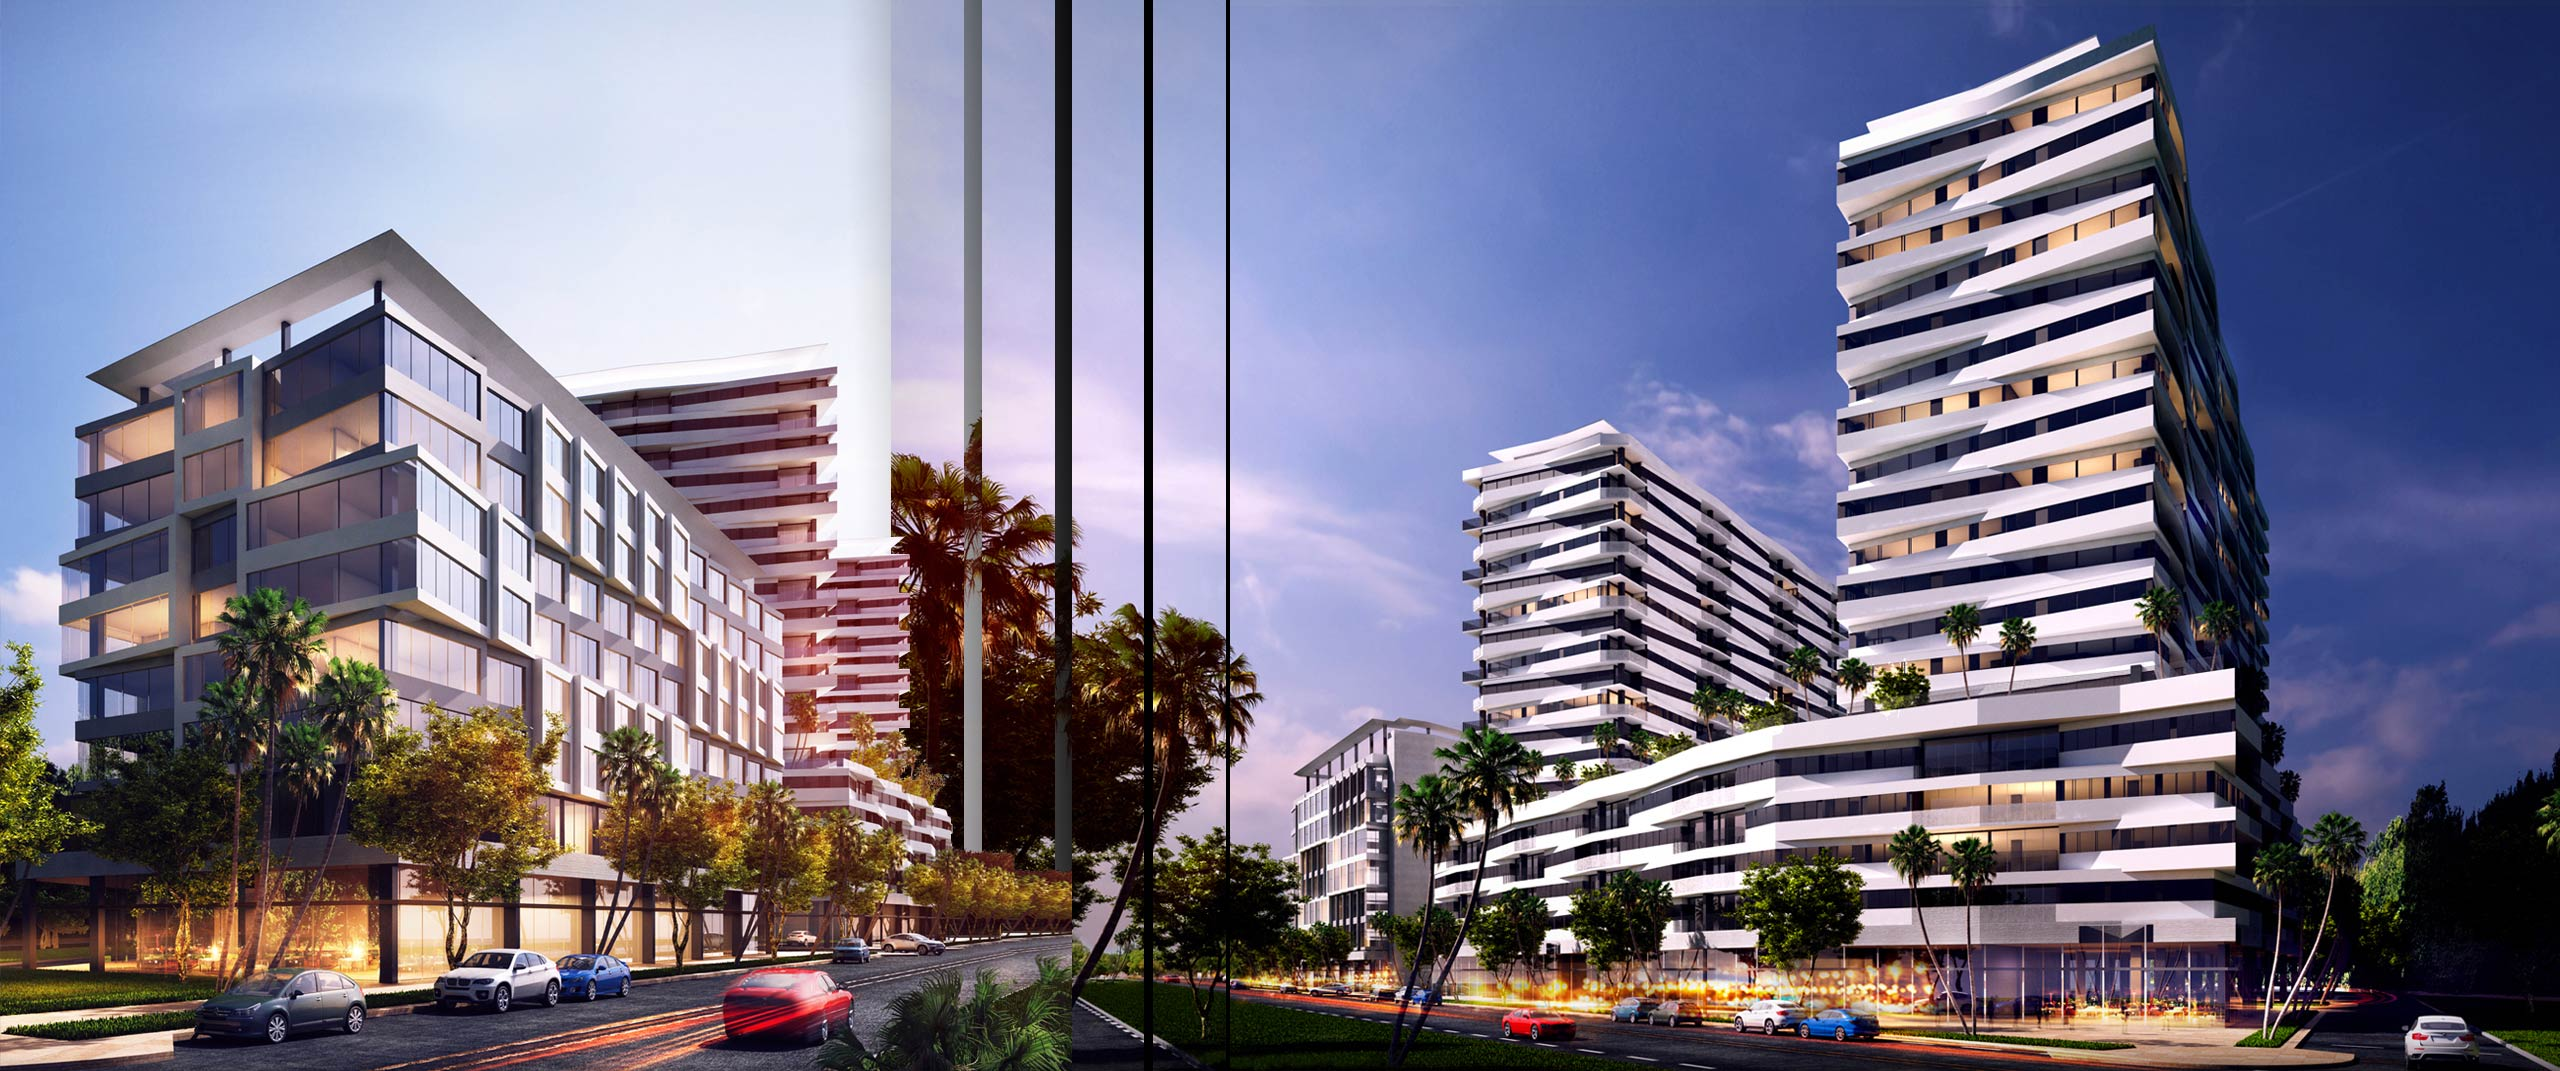 Beach Real Estate Developers : North miami beach real estate development macken